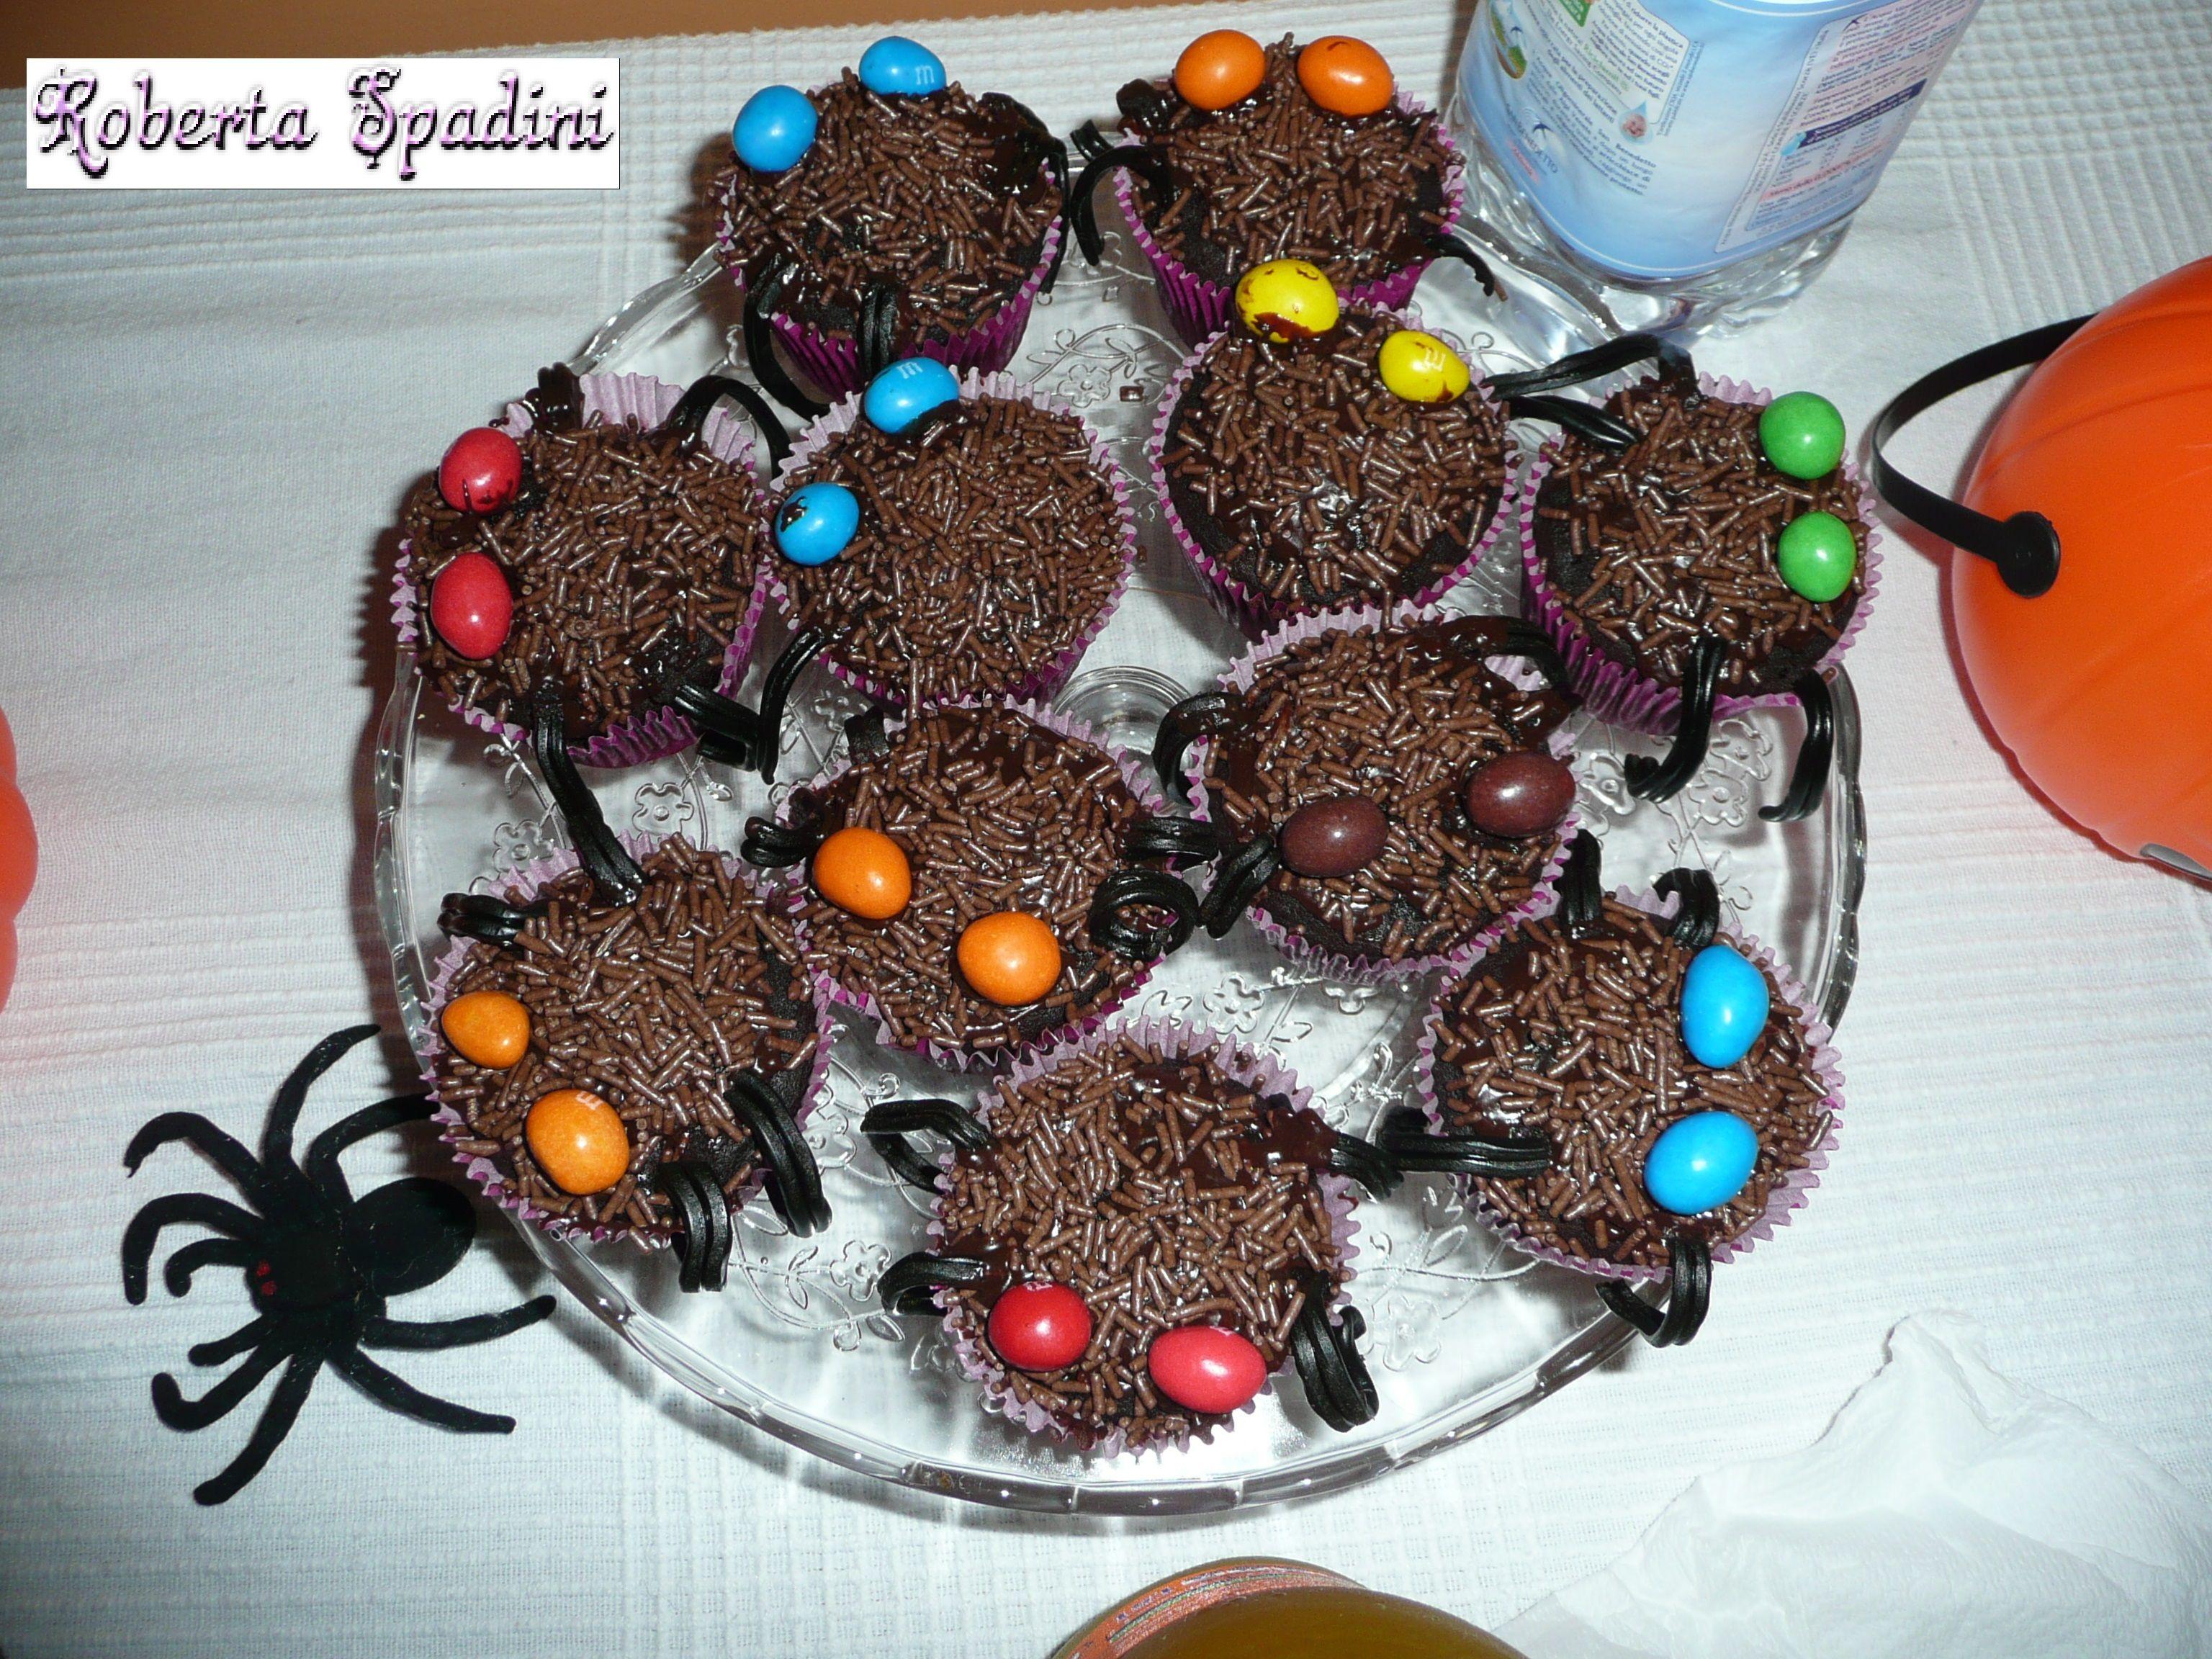 halloween cupcake my friend made for Halloween. Best cupcake eveeeeeer!!